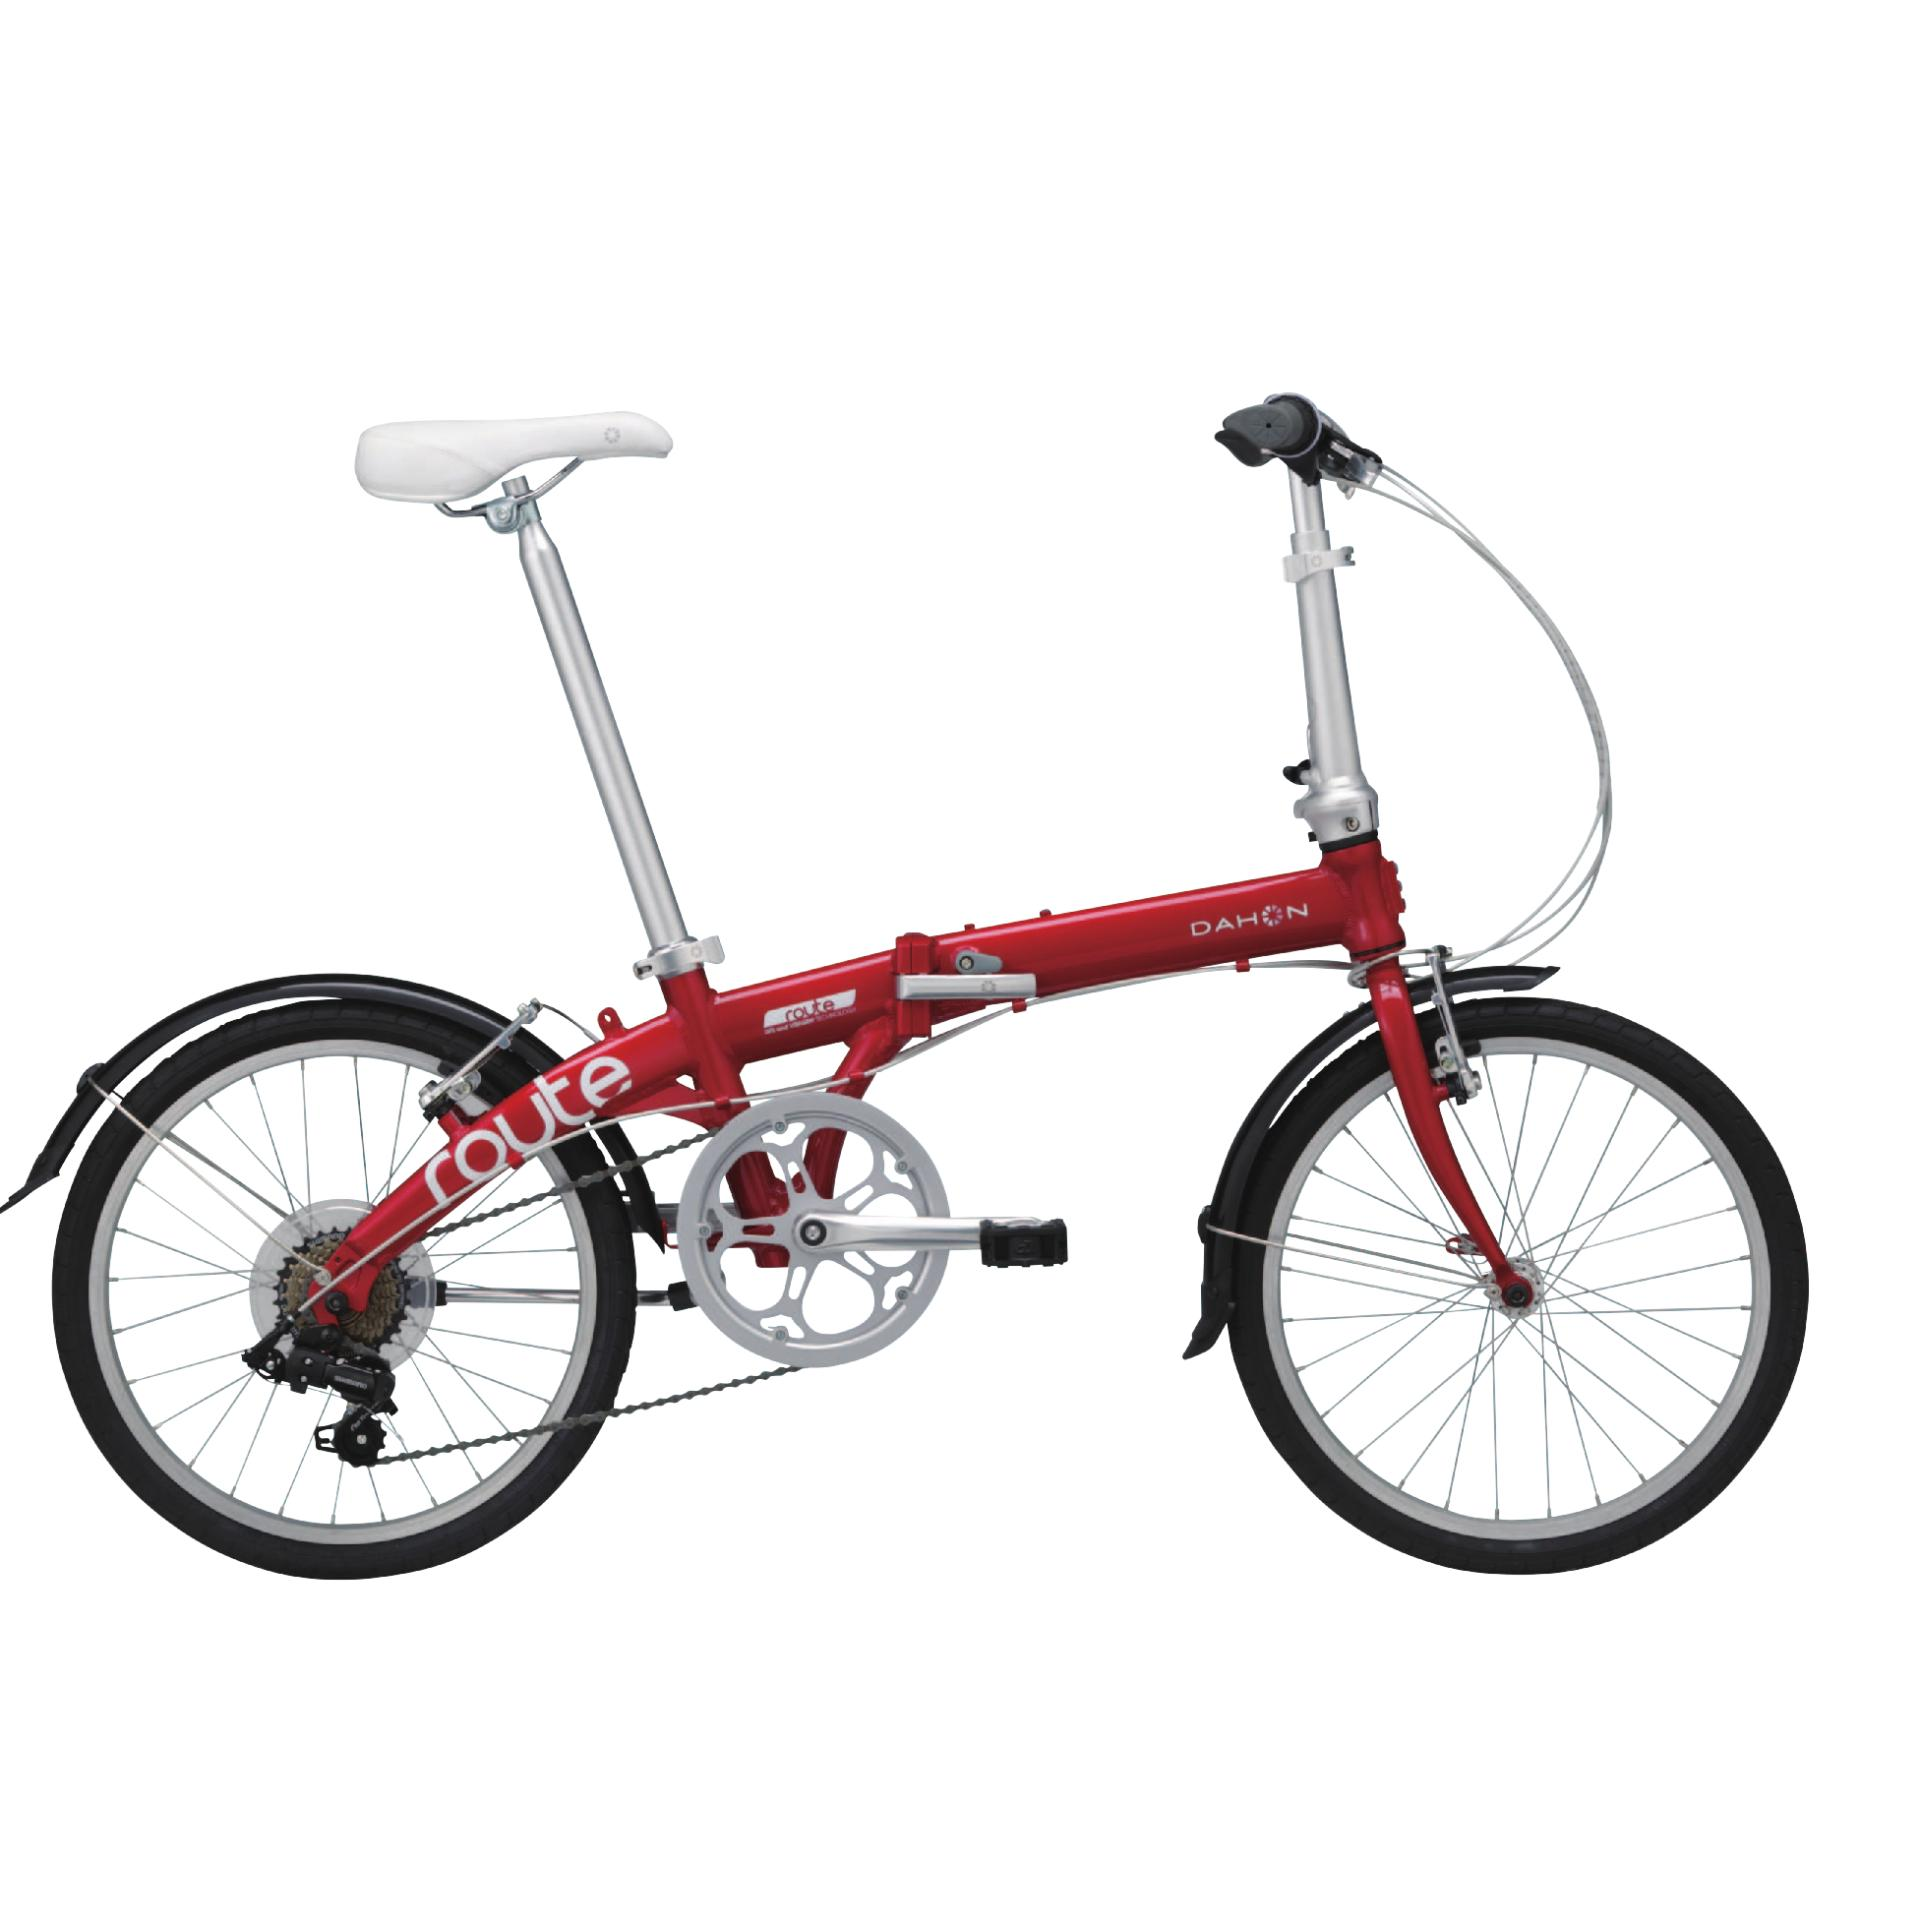 69e34da356a Dahon Philippines: Dahon price list - Folding Bike for sale | Lazada